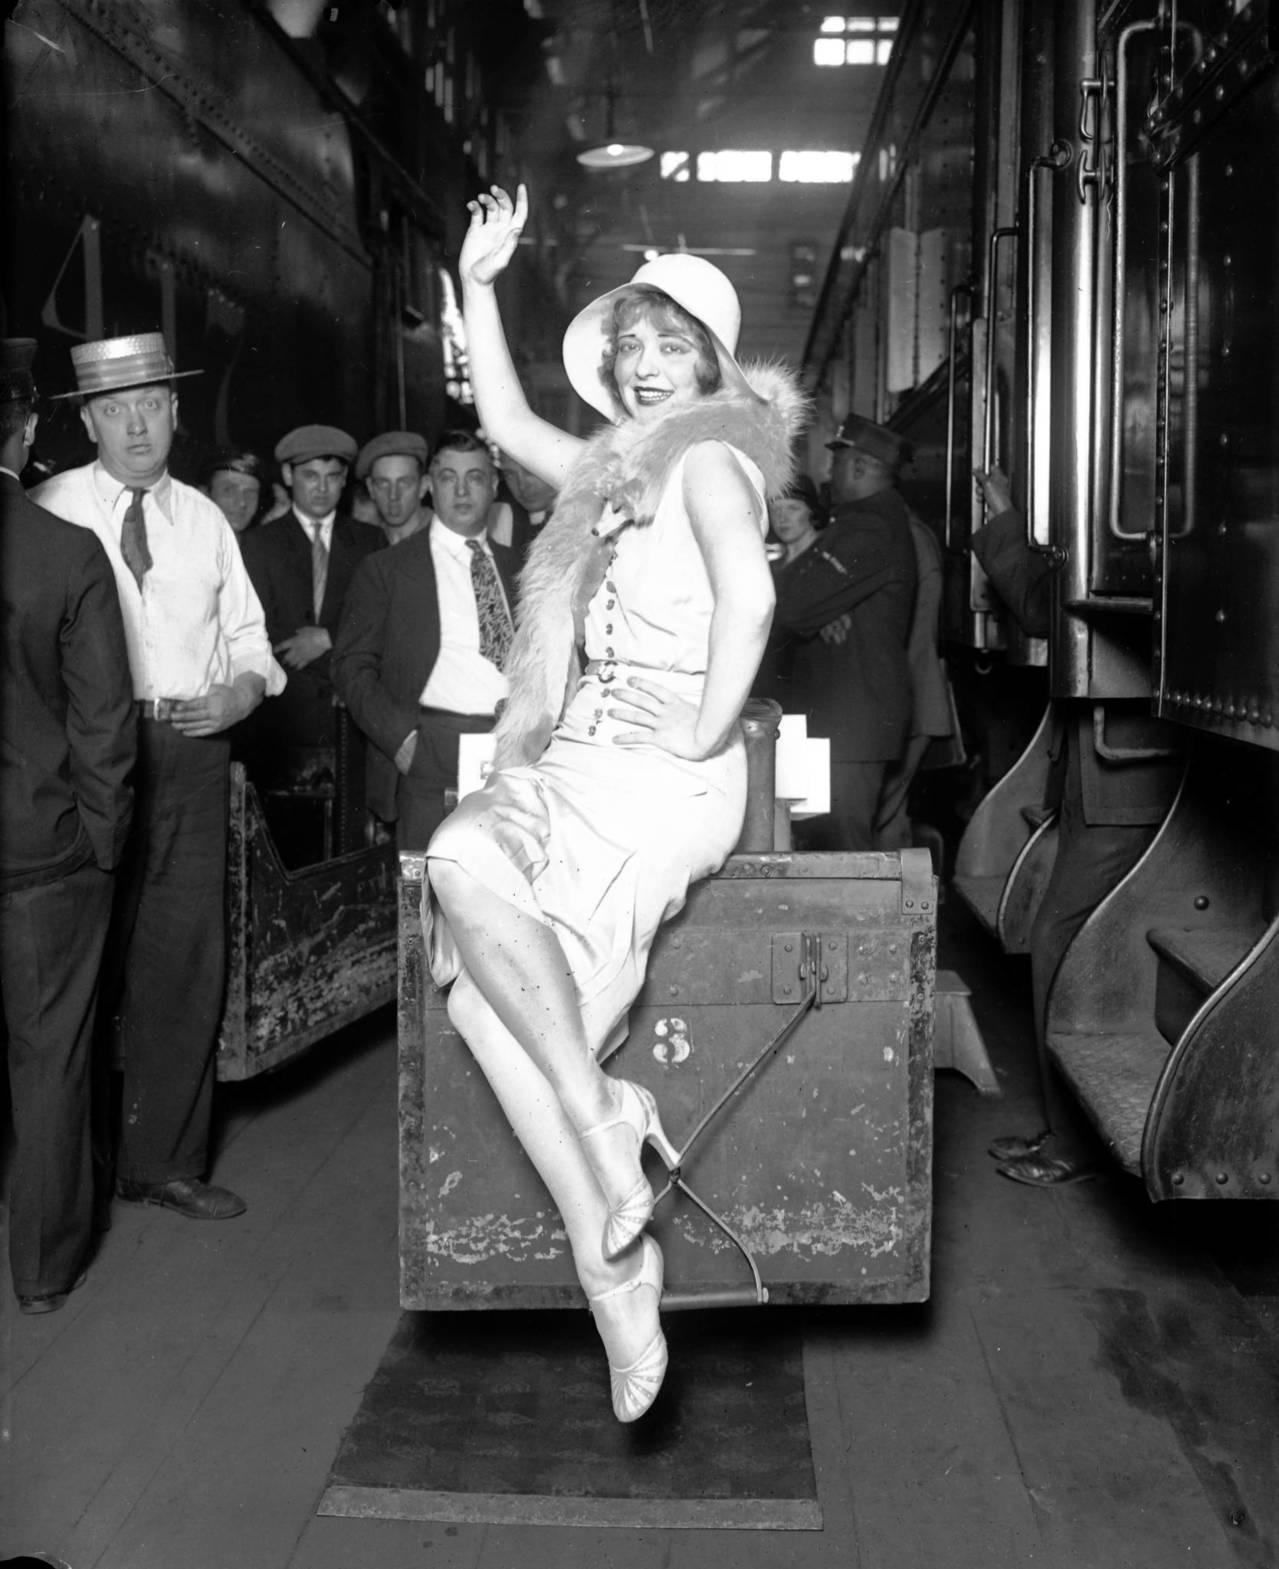 Film actress Clara Bow, Jul. 7 1930. Bow was the original